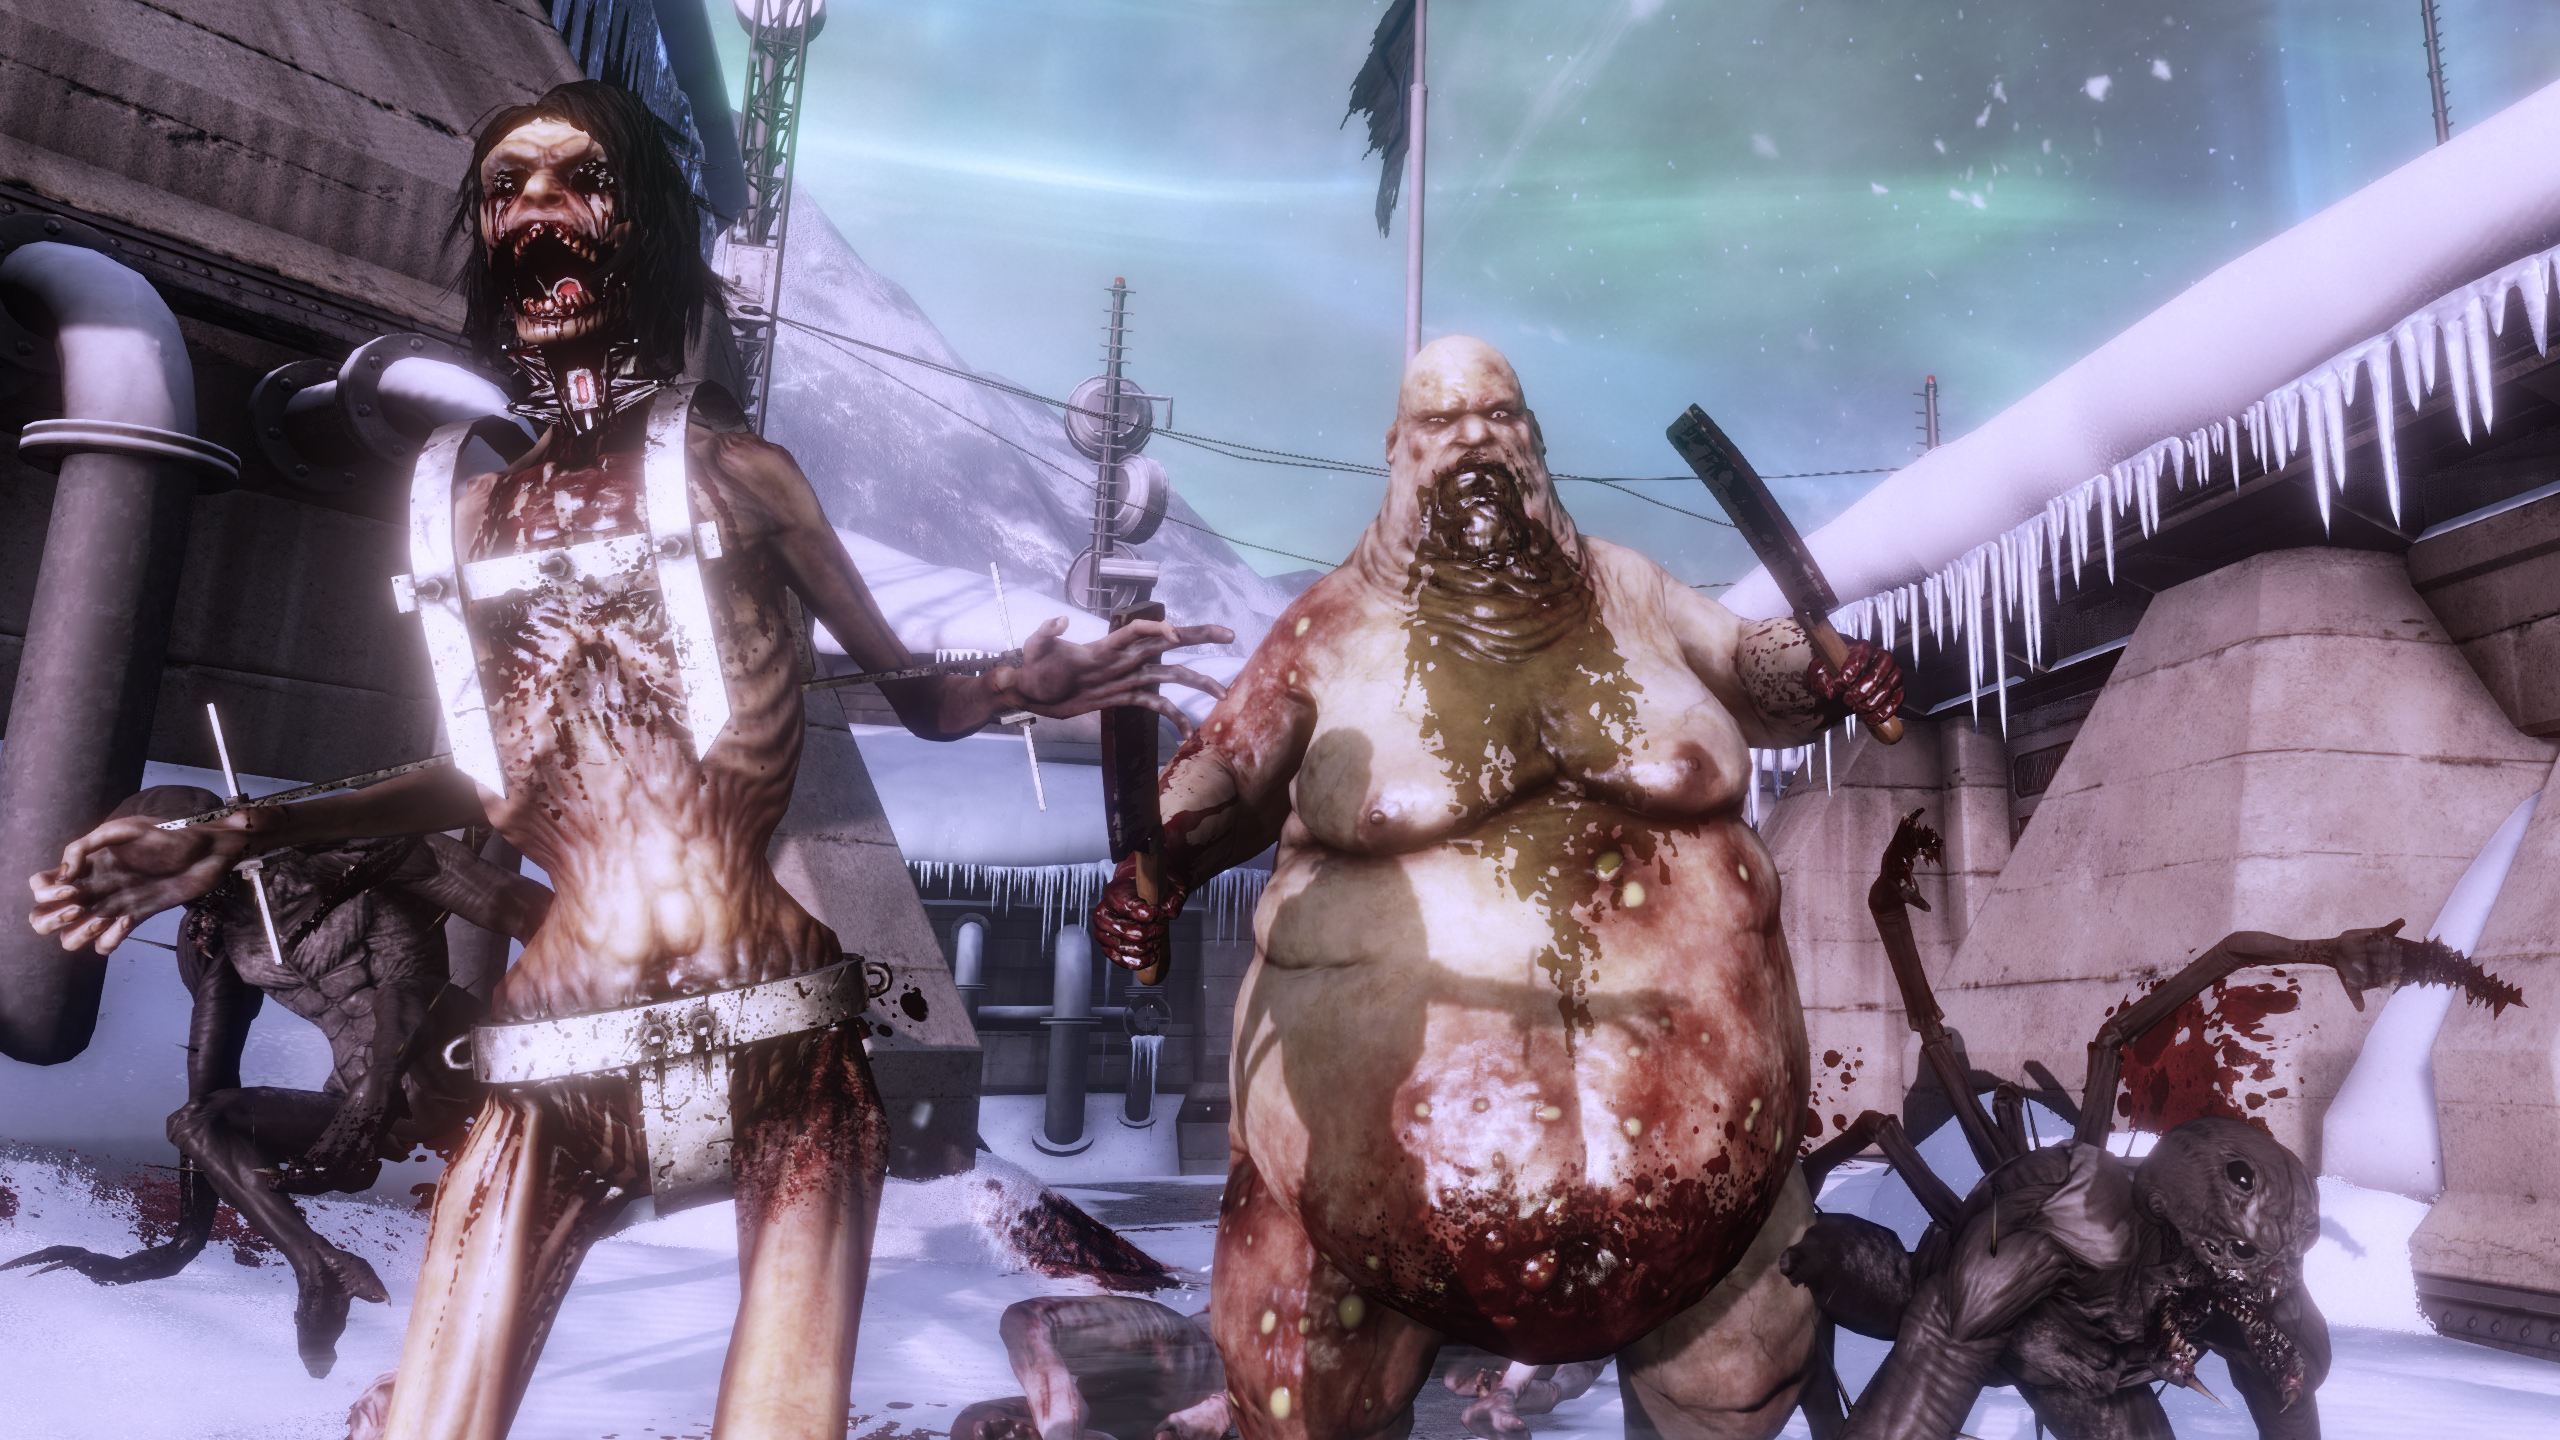 Čerstvá várka krvavých screenshotů z Killing Floor 2 105154